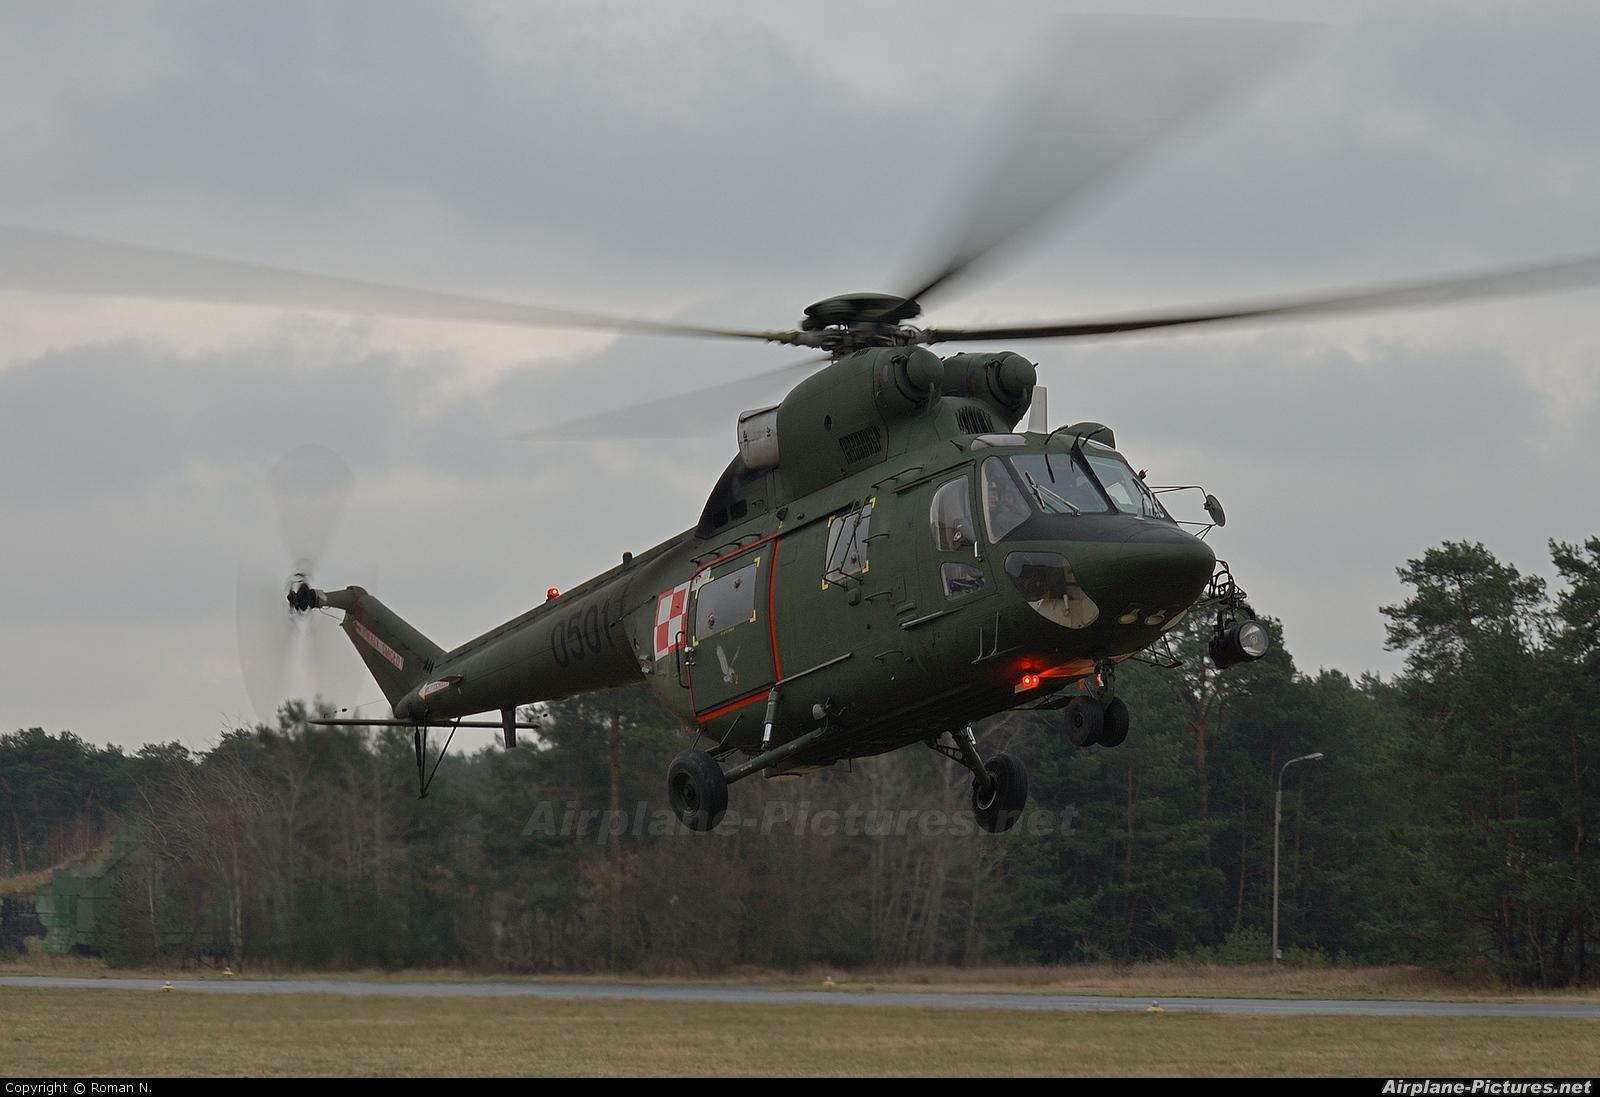 Poland - Air Force 0501 aircraft at Bydgoszcz - Szwederowo